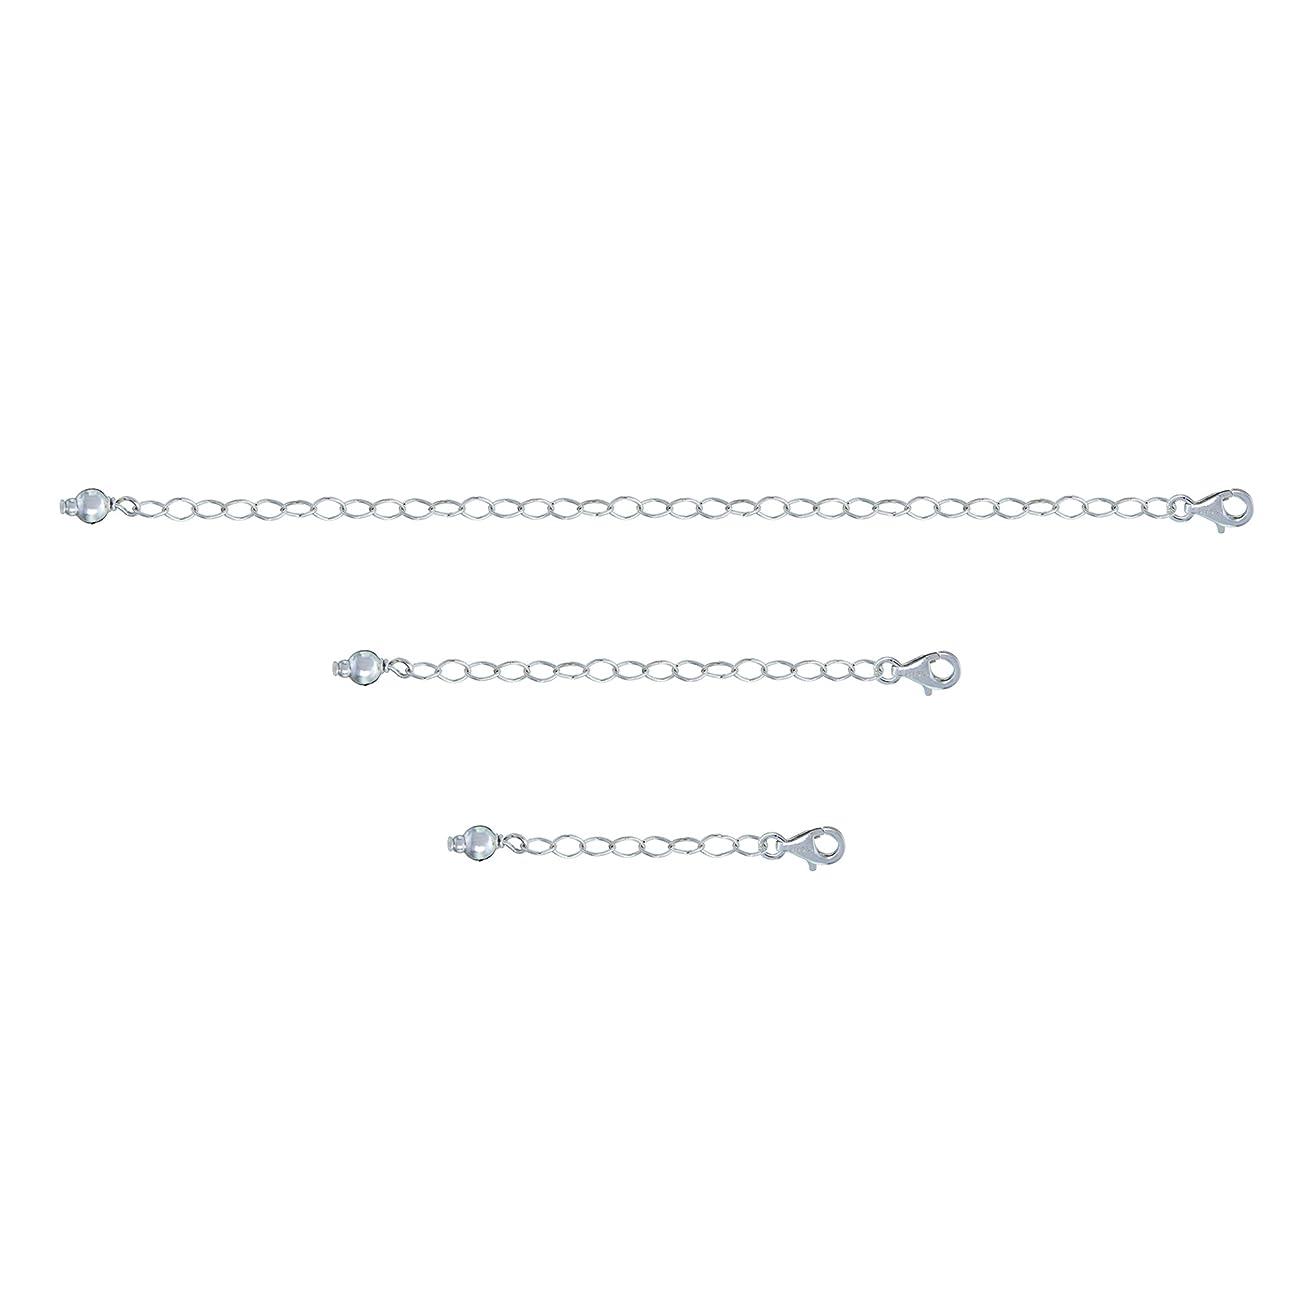 GemStar USA Sterling Silver Pendant Necklace Bracelet Anklet Chain Extenders for Necklace, 1